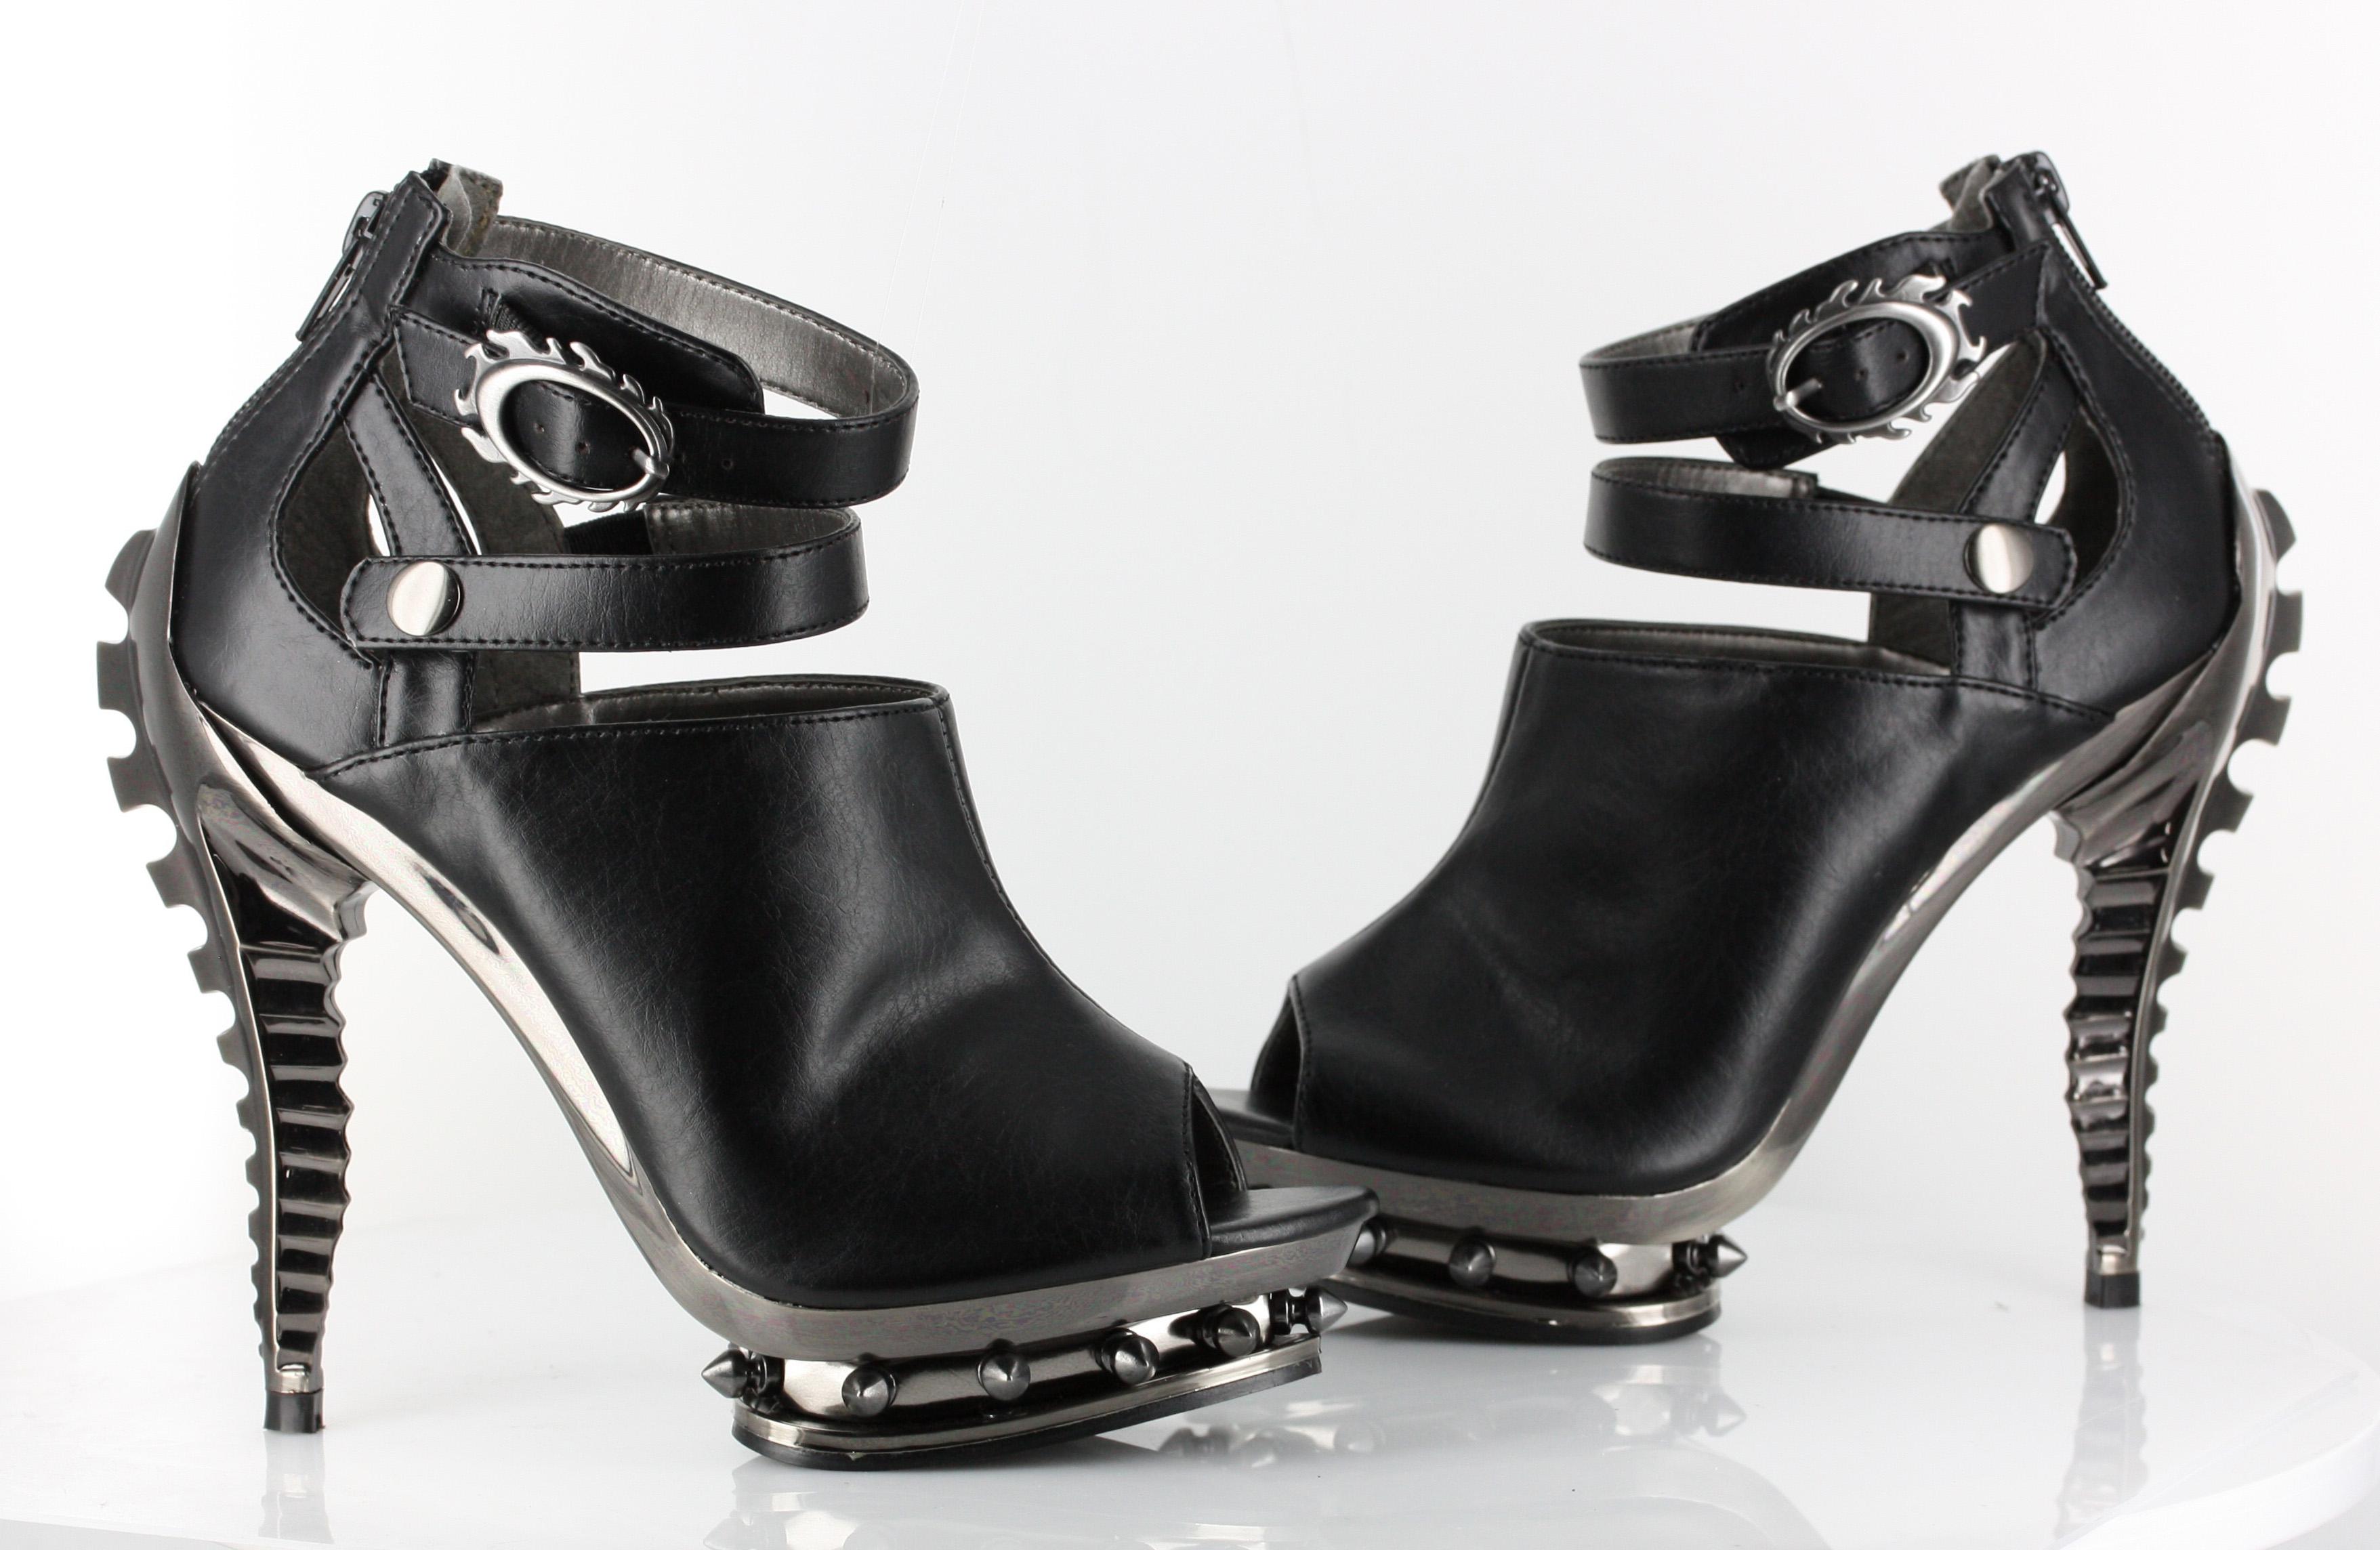 hades_shoes_rogue_steampunk_spinal_heel_booties_booties_8.jpg